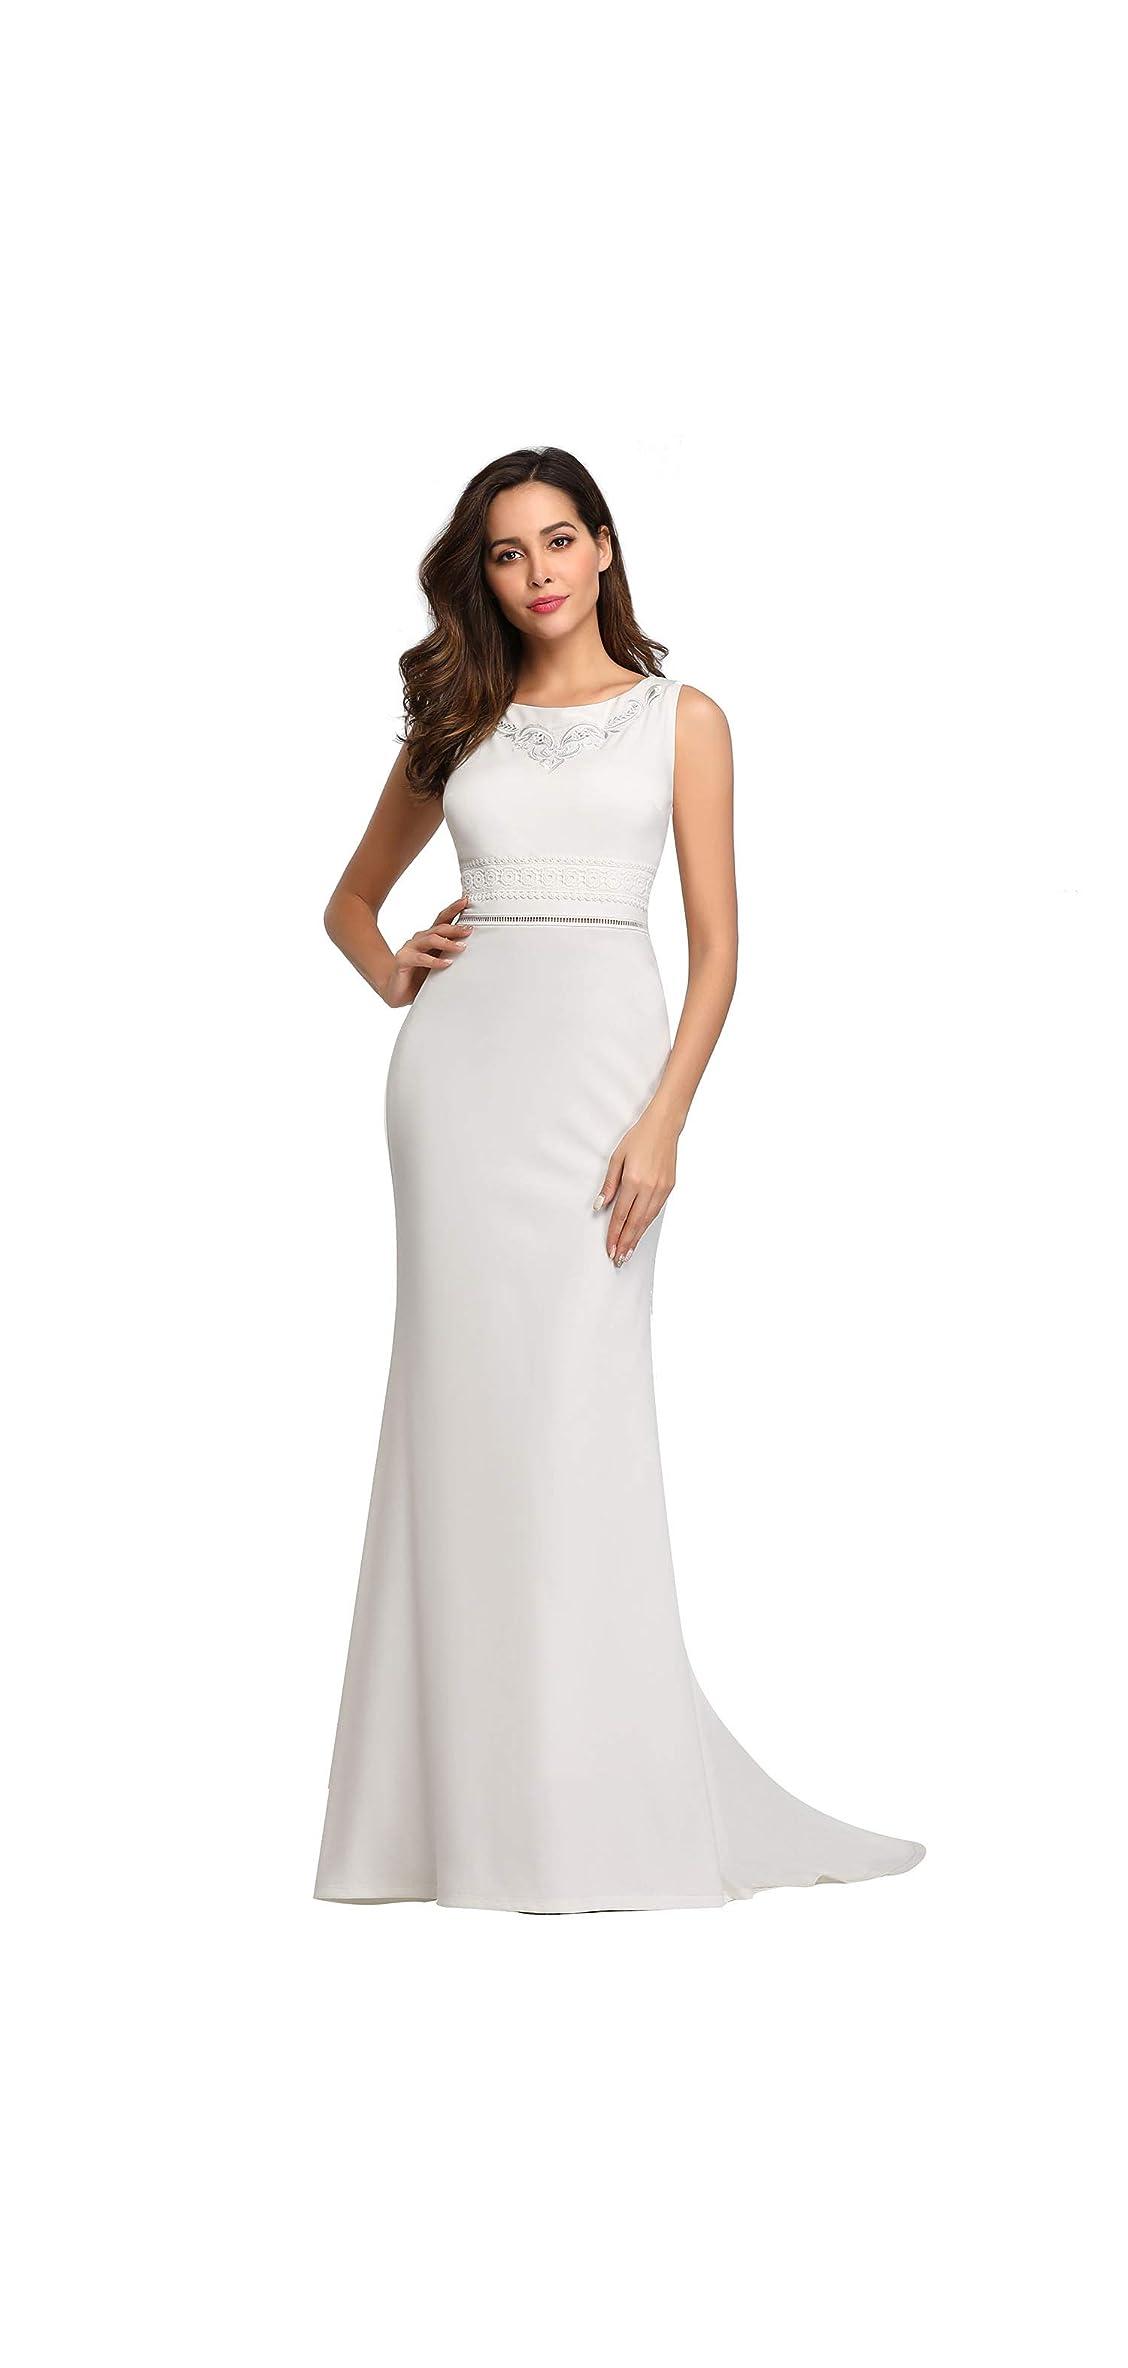 Women's Sleeveless Bodycon Mermaid Dress Floor Dress